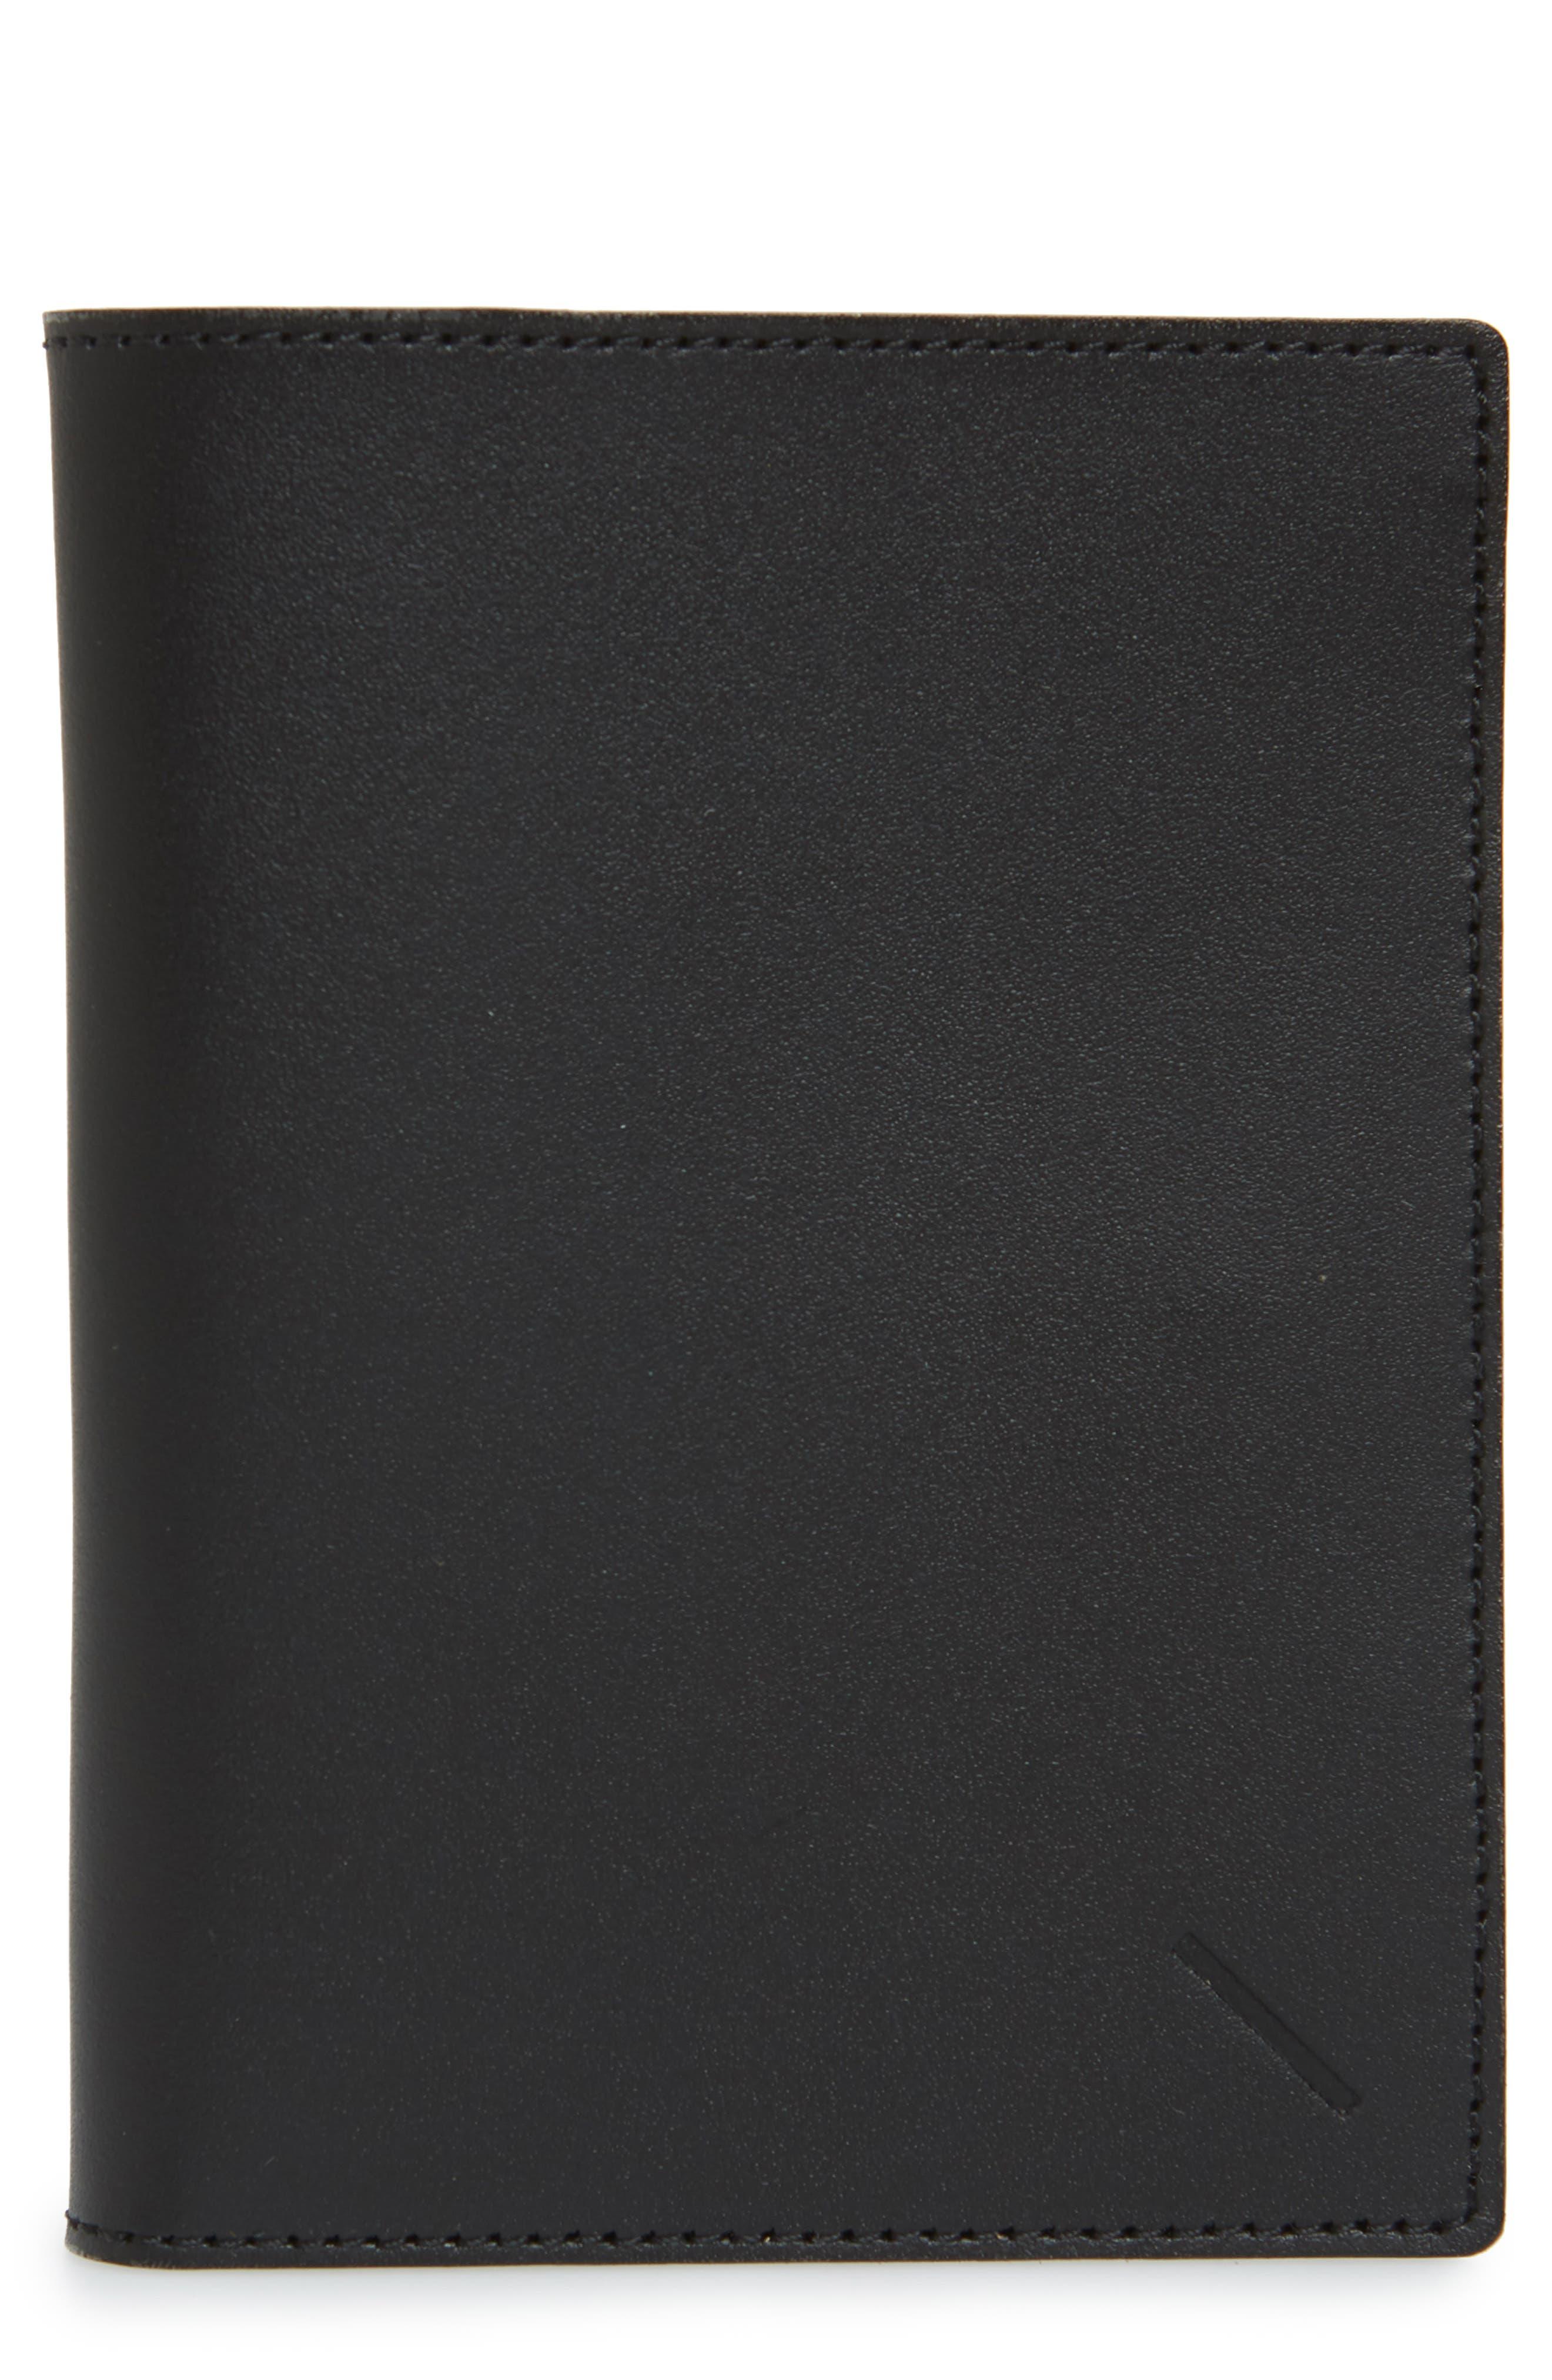 SATURDAYS NYC, Leather Passport Wallet, Main thumbnail 1, color, BLACK